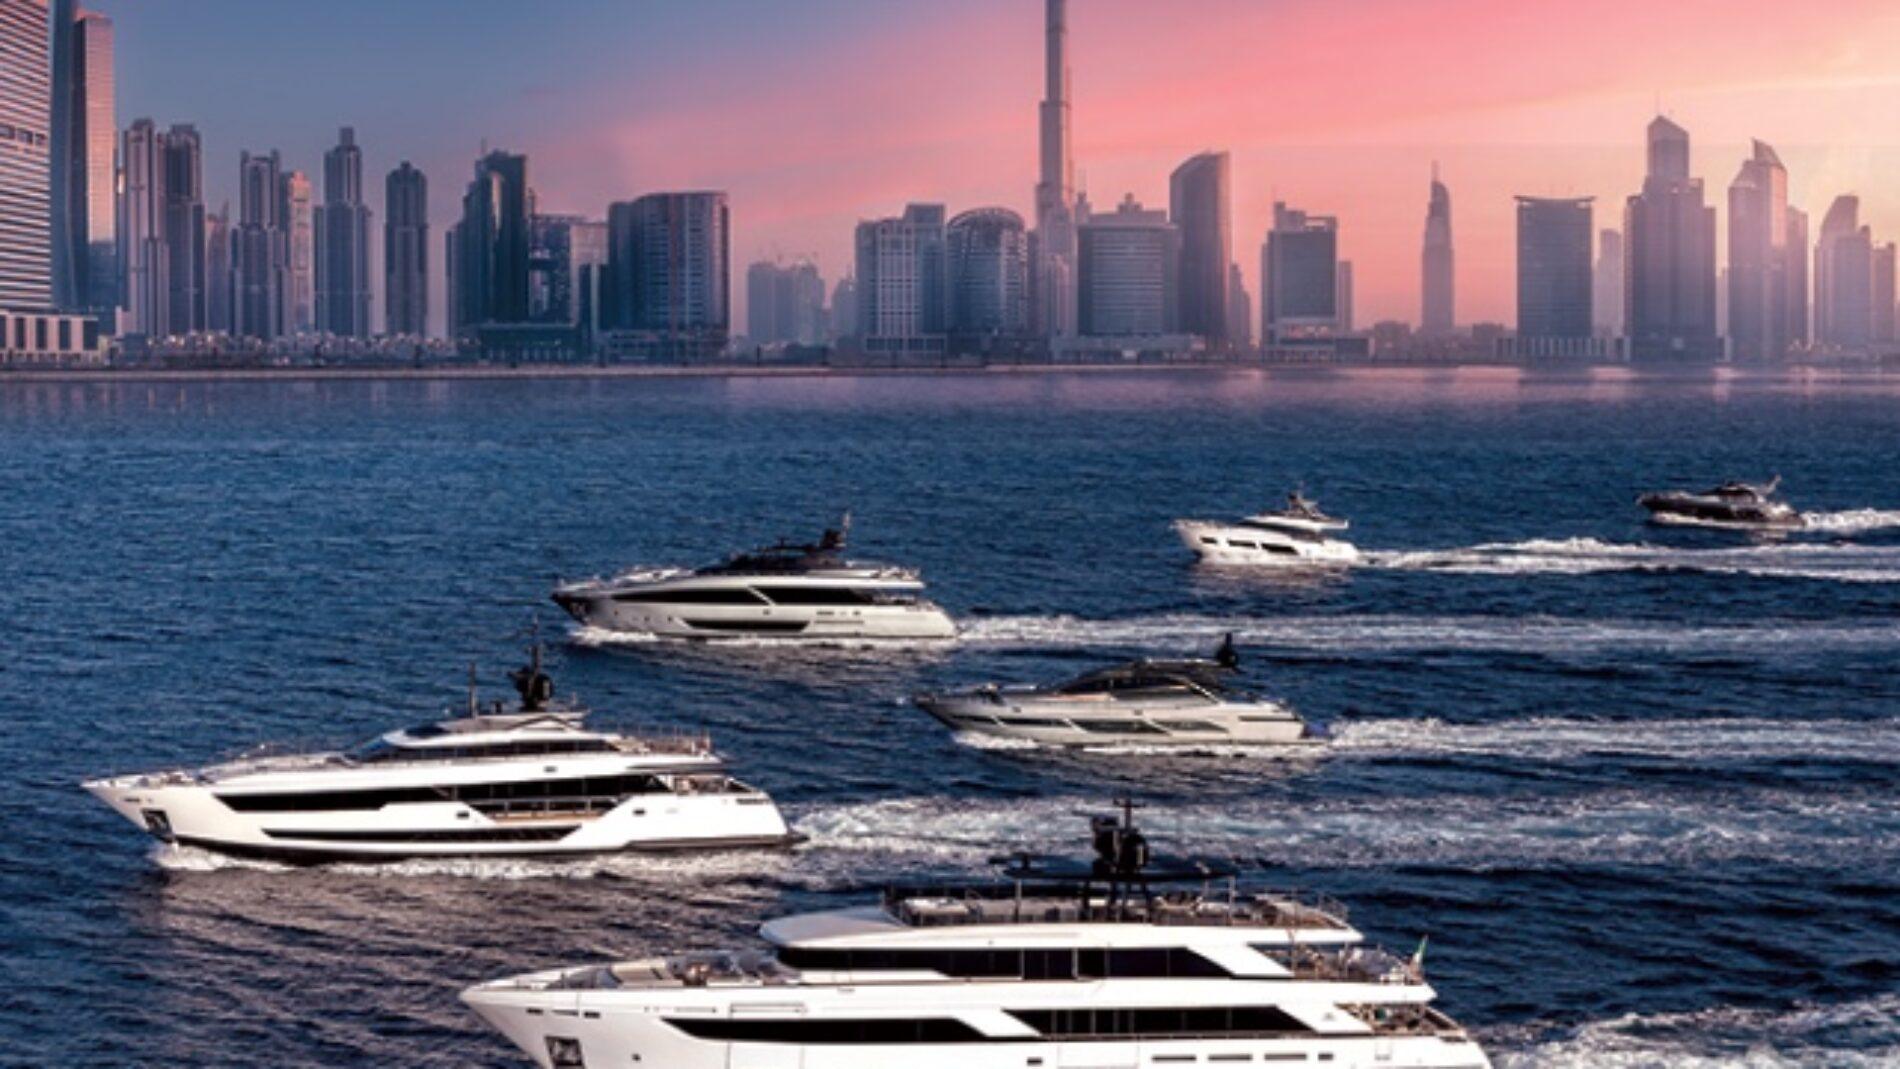 FG Dubai B2c